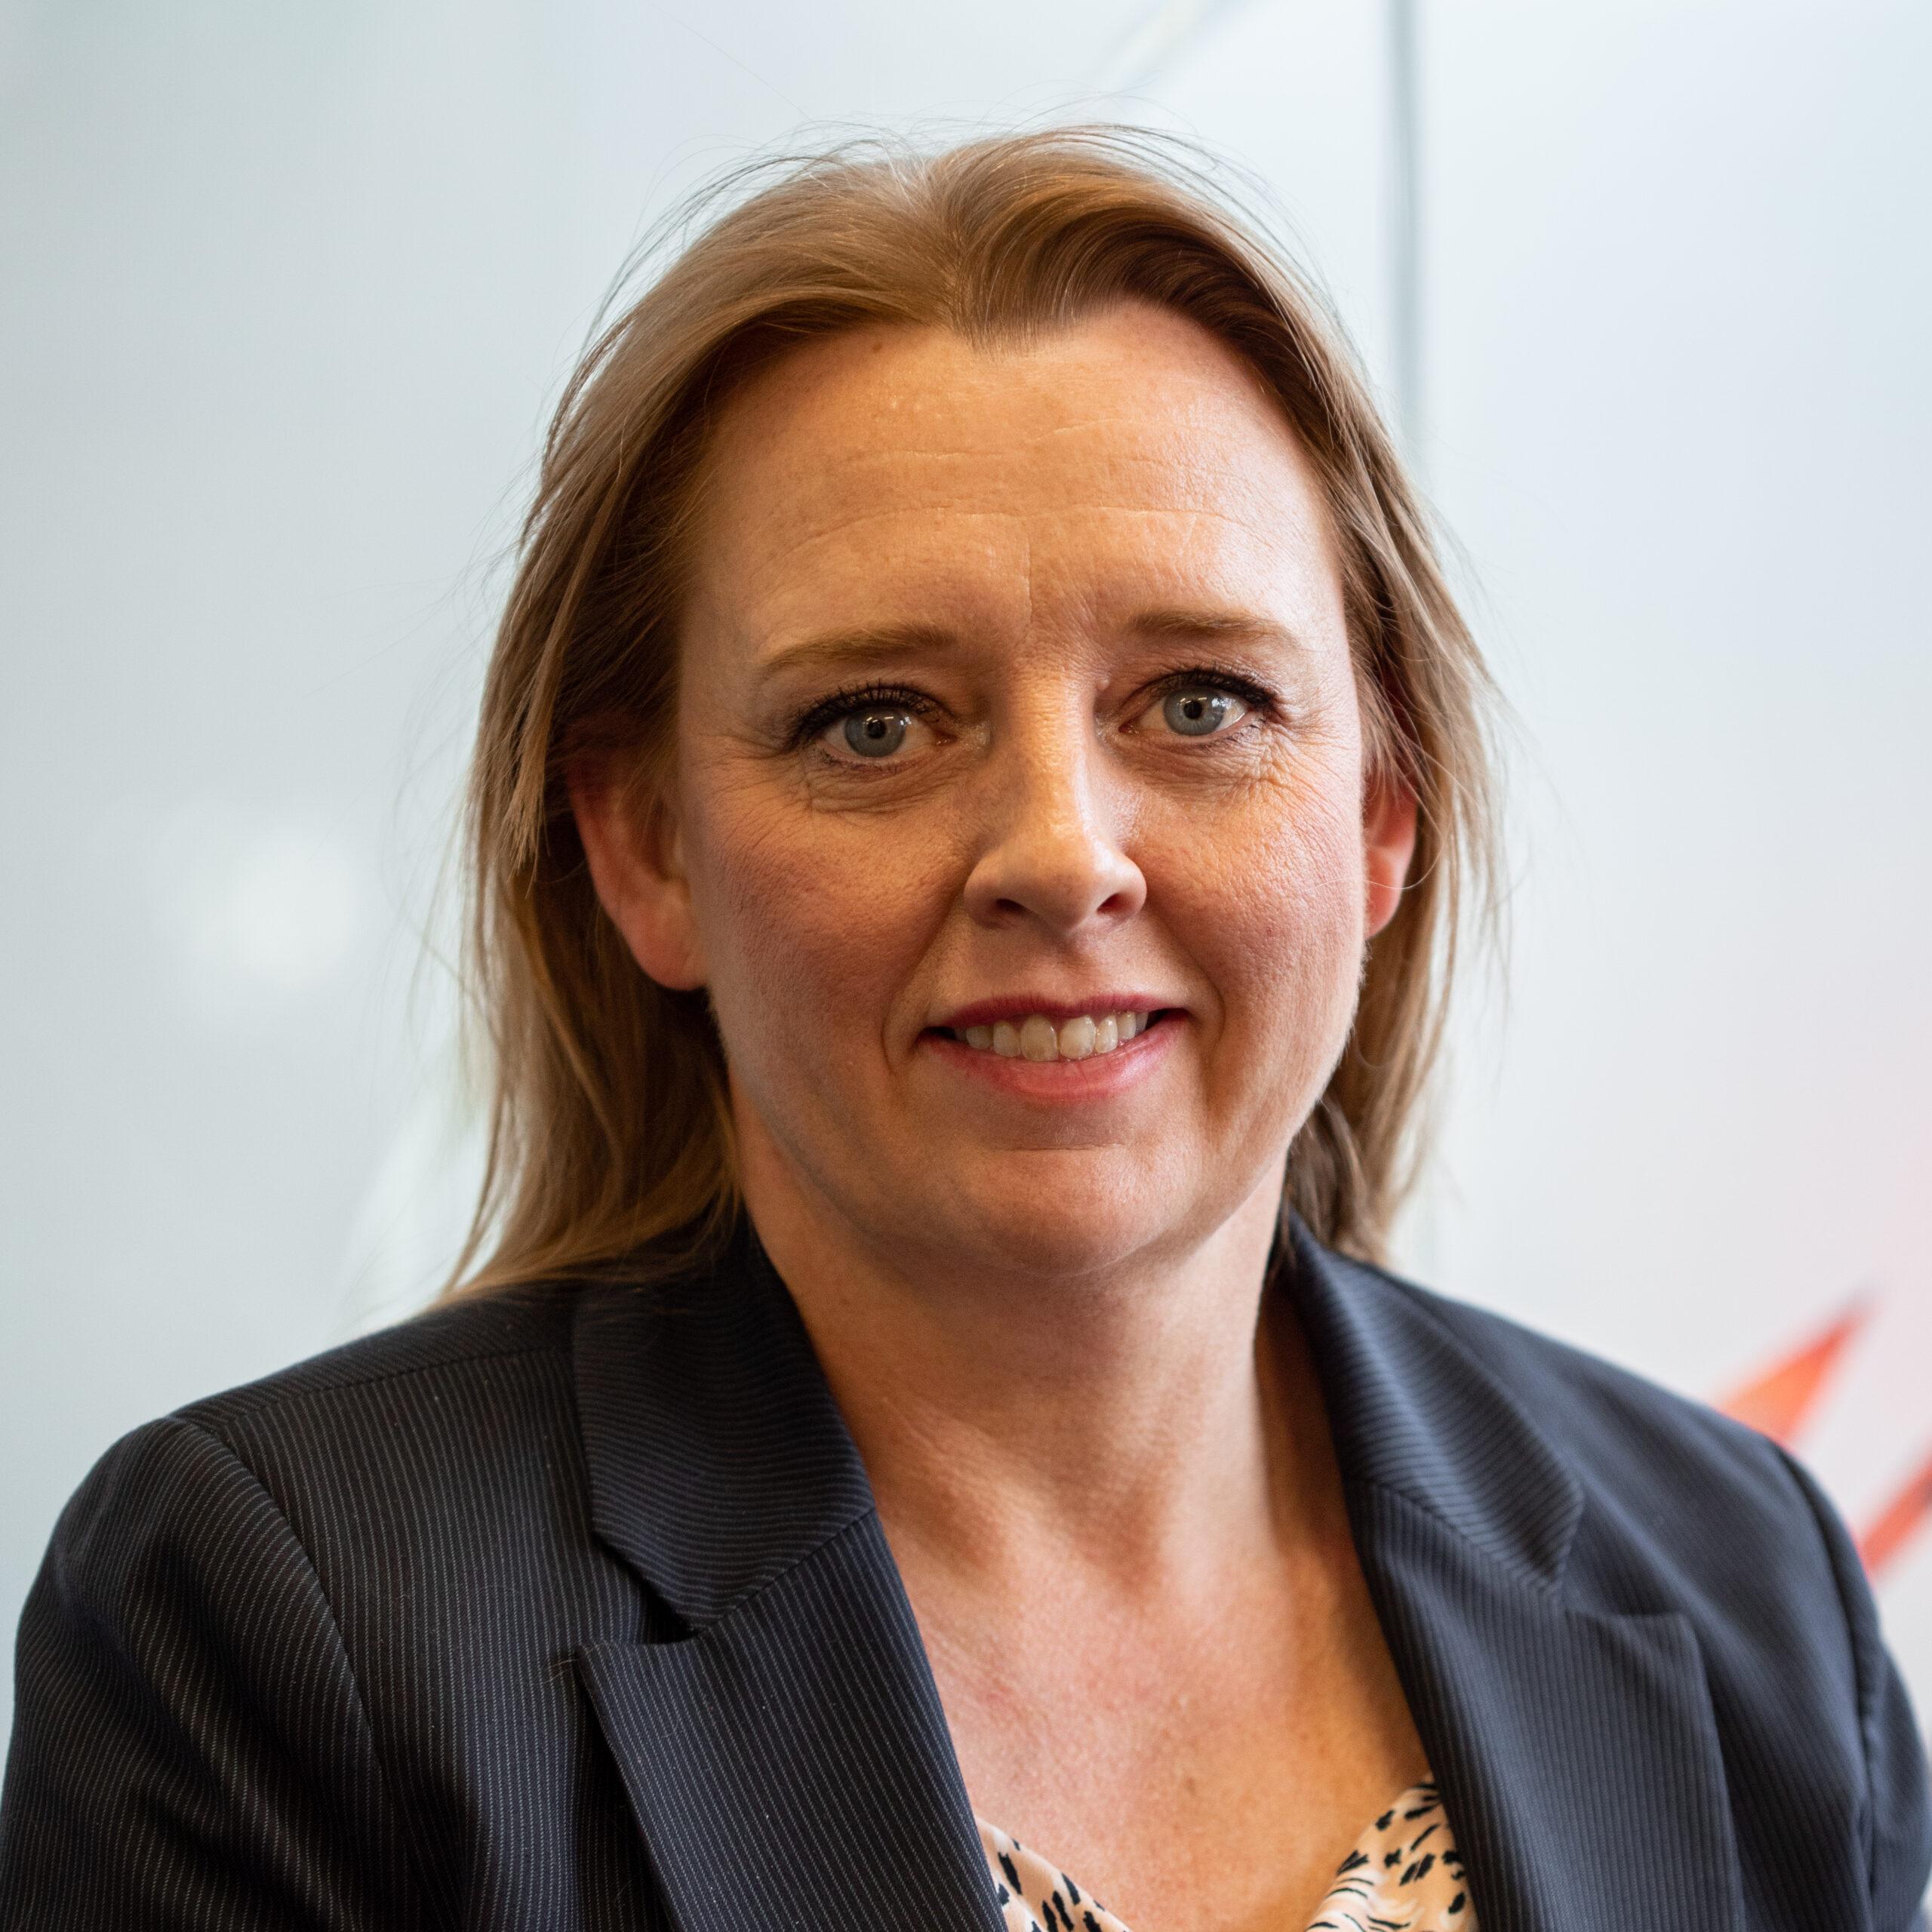 Beth McKenzie